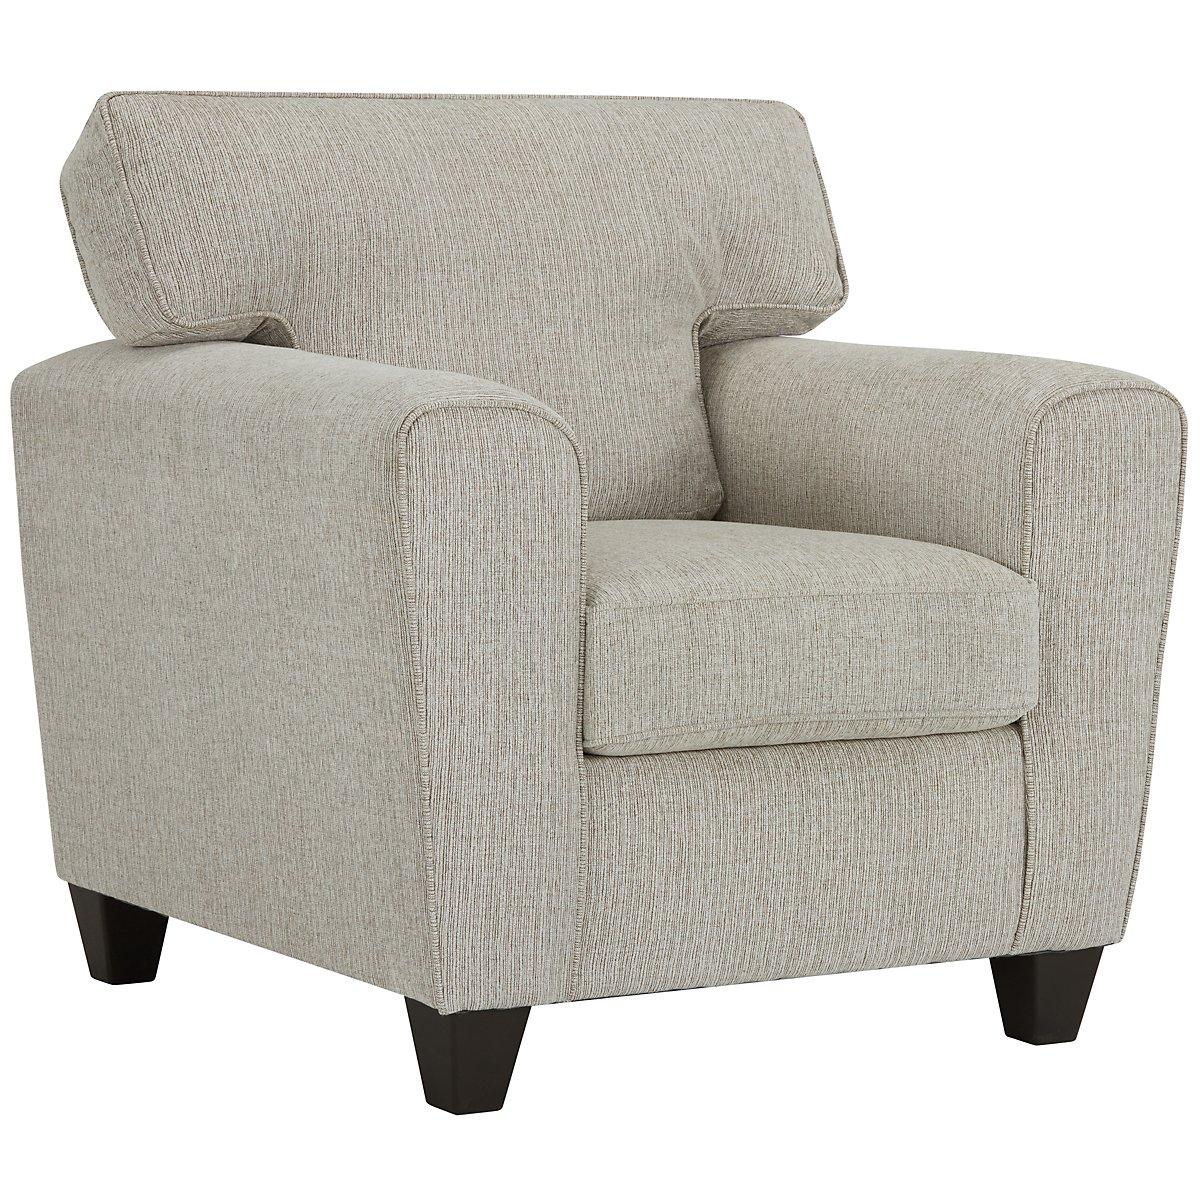 Zoey Light Beige Microfiber Chair